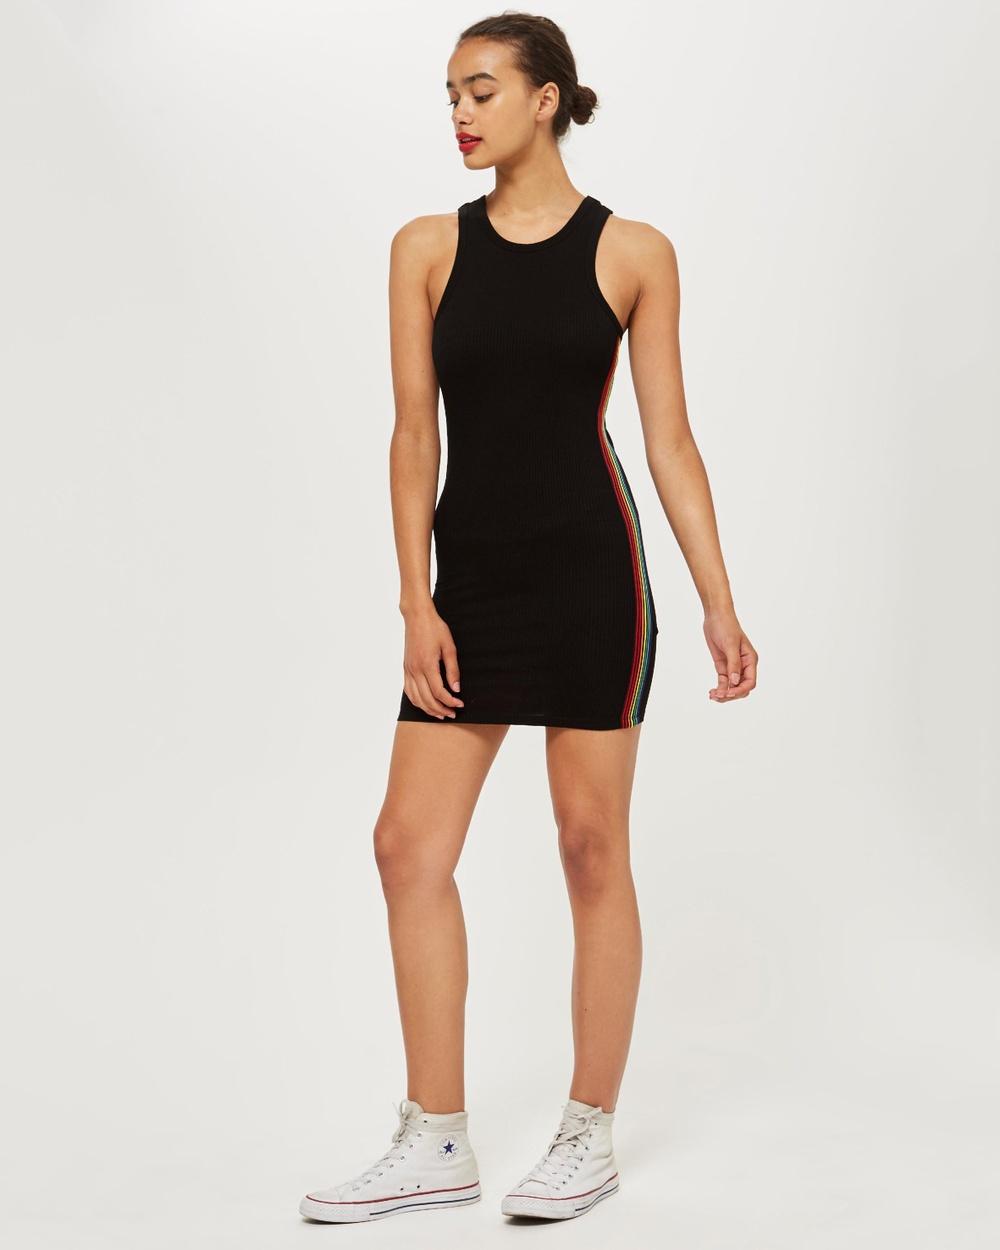 TOPSHOP Petite Black Rainbow Stripe Body-Con Dress